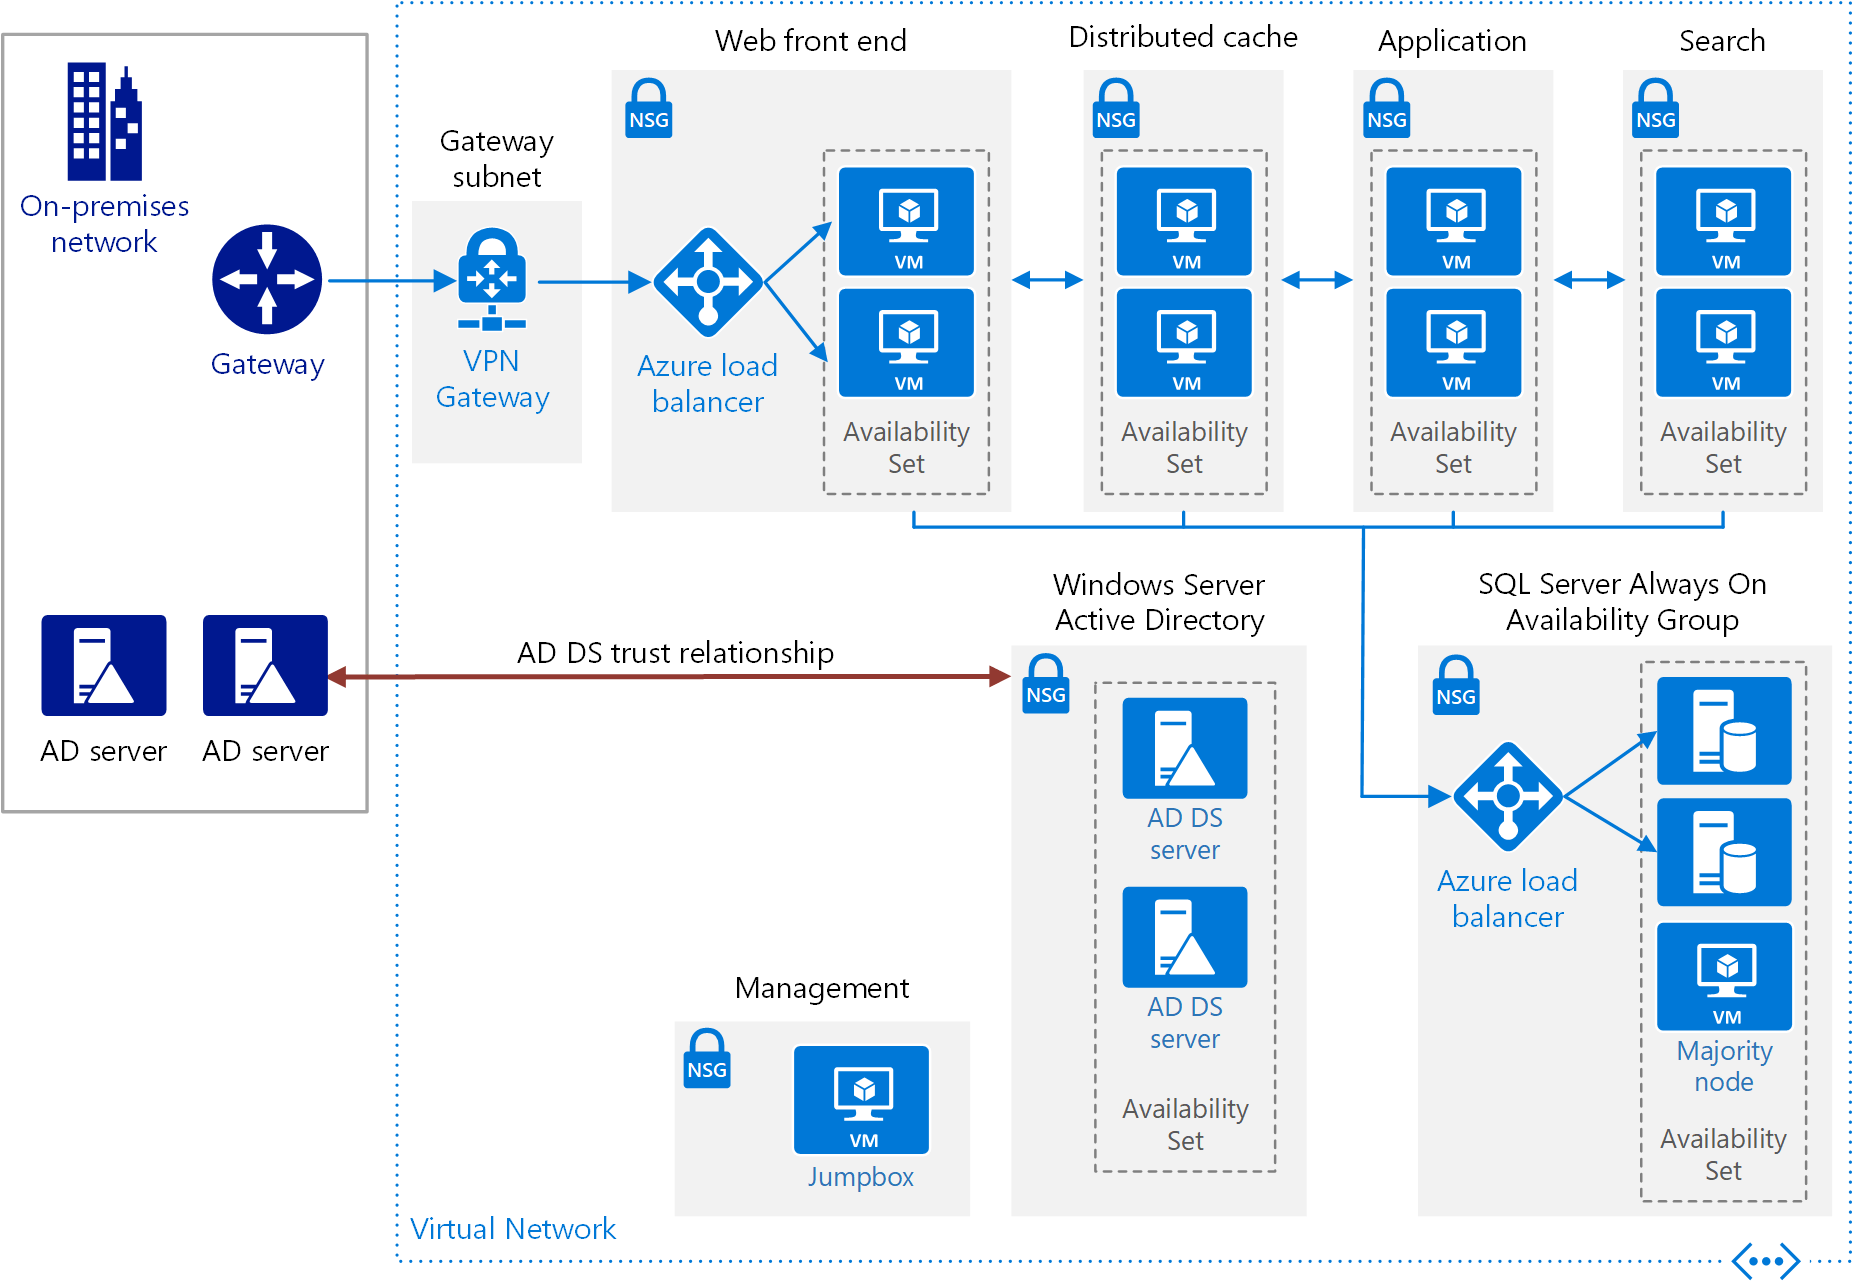 sap portal architecture diagram atv winch wiring een sharepoint server 2016 farm met hoge beschikbaarheid